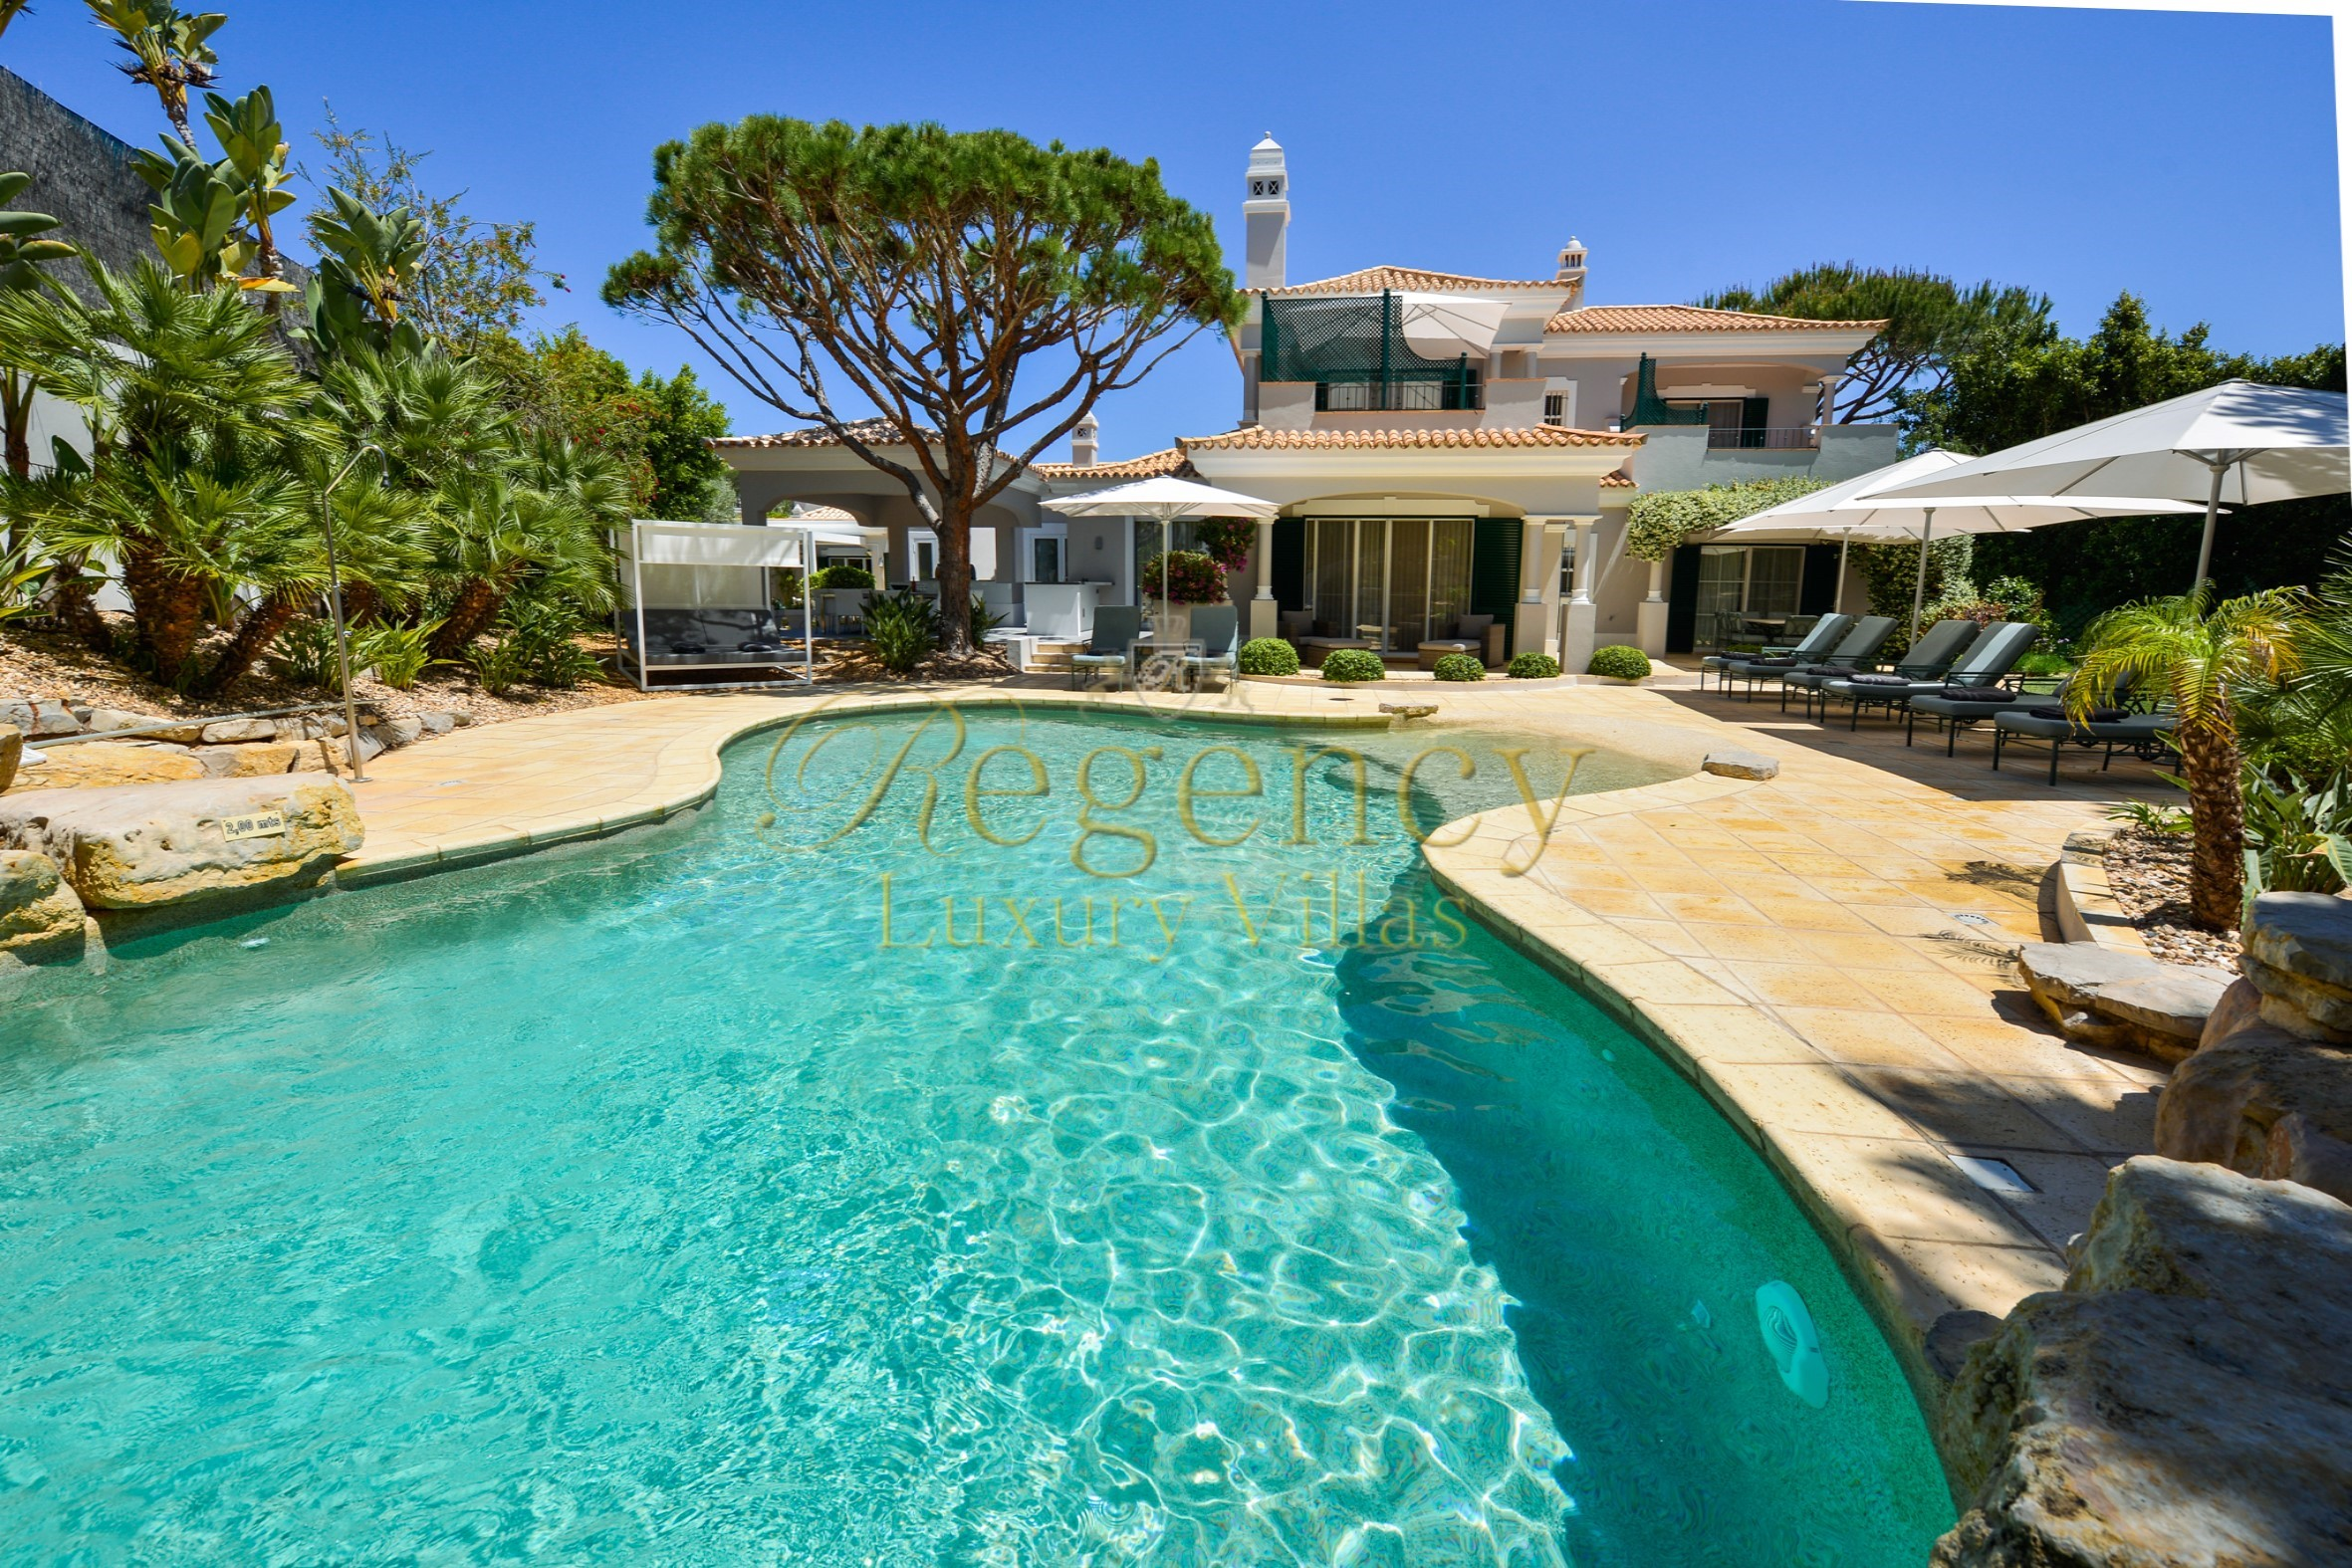 4 Bedroom Villa To Rent In Vale Do Lobo Villa Kyanite Regency Luxury Villas 21